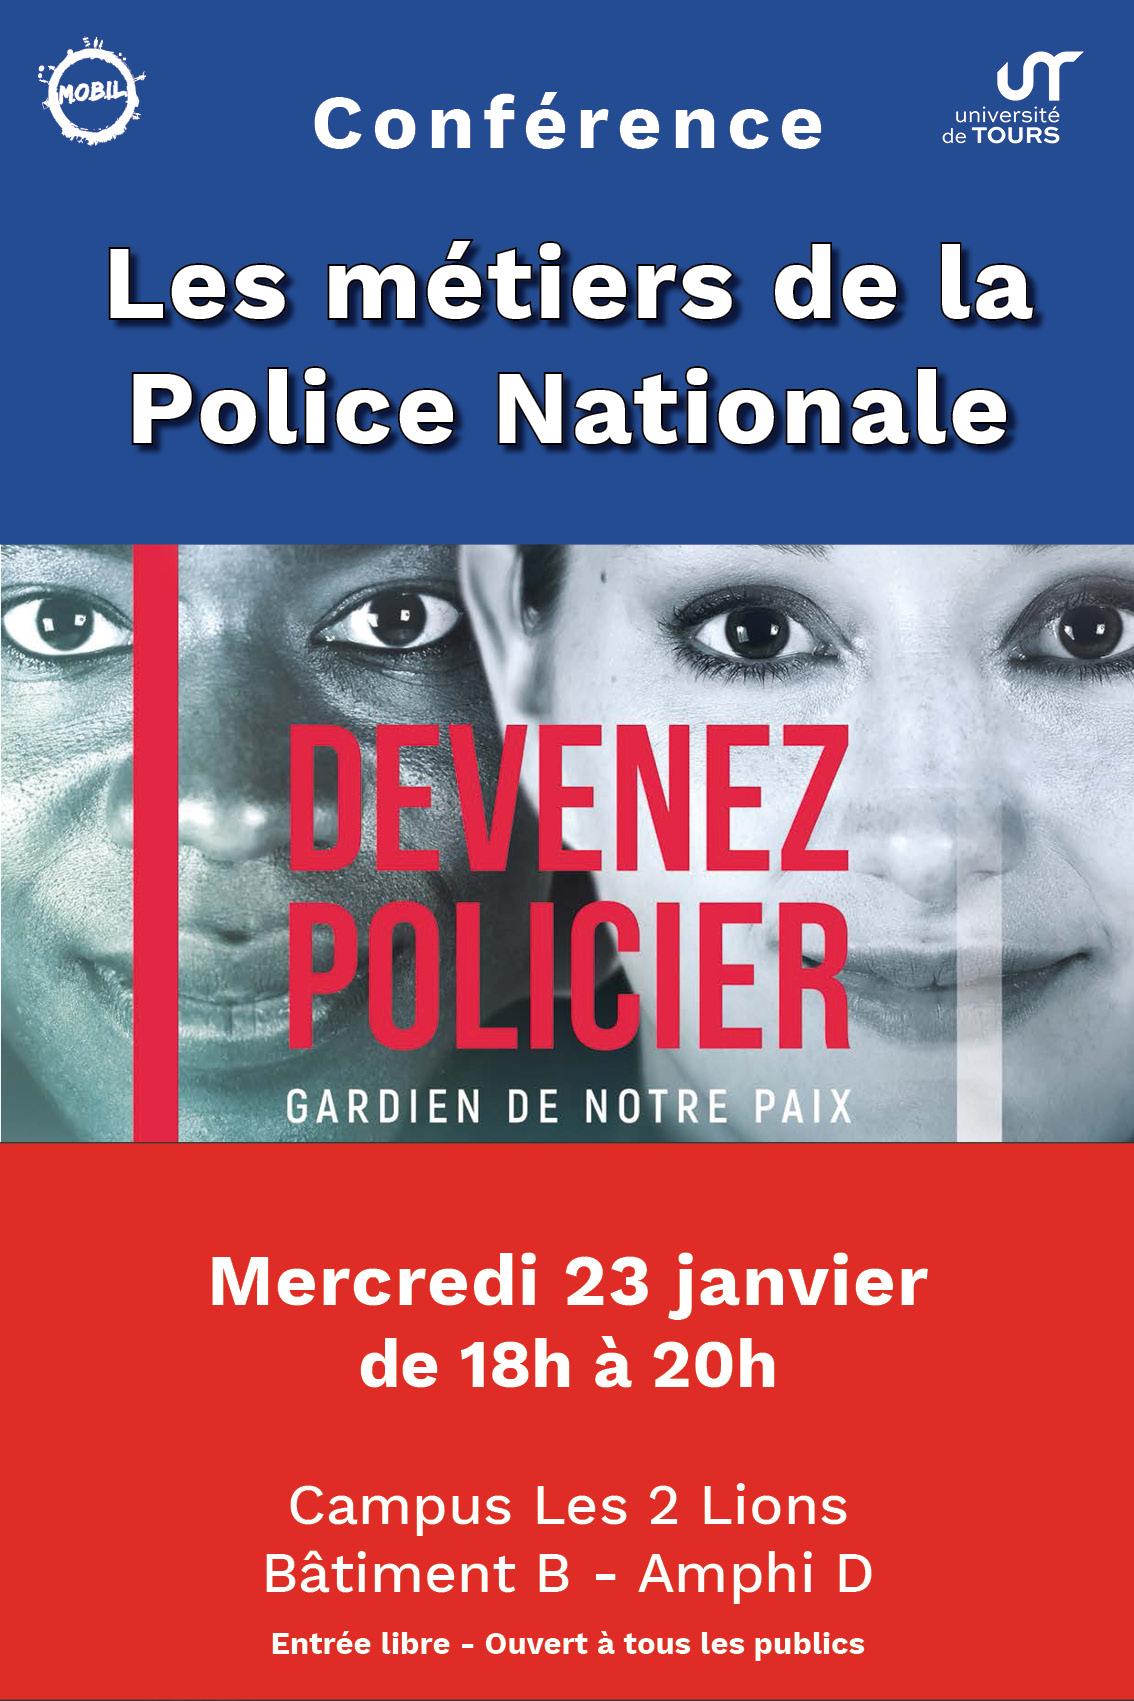 Conférence métiers de la police nationale